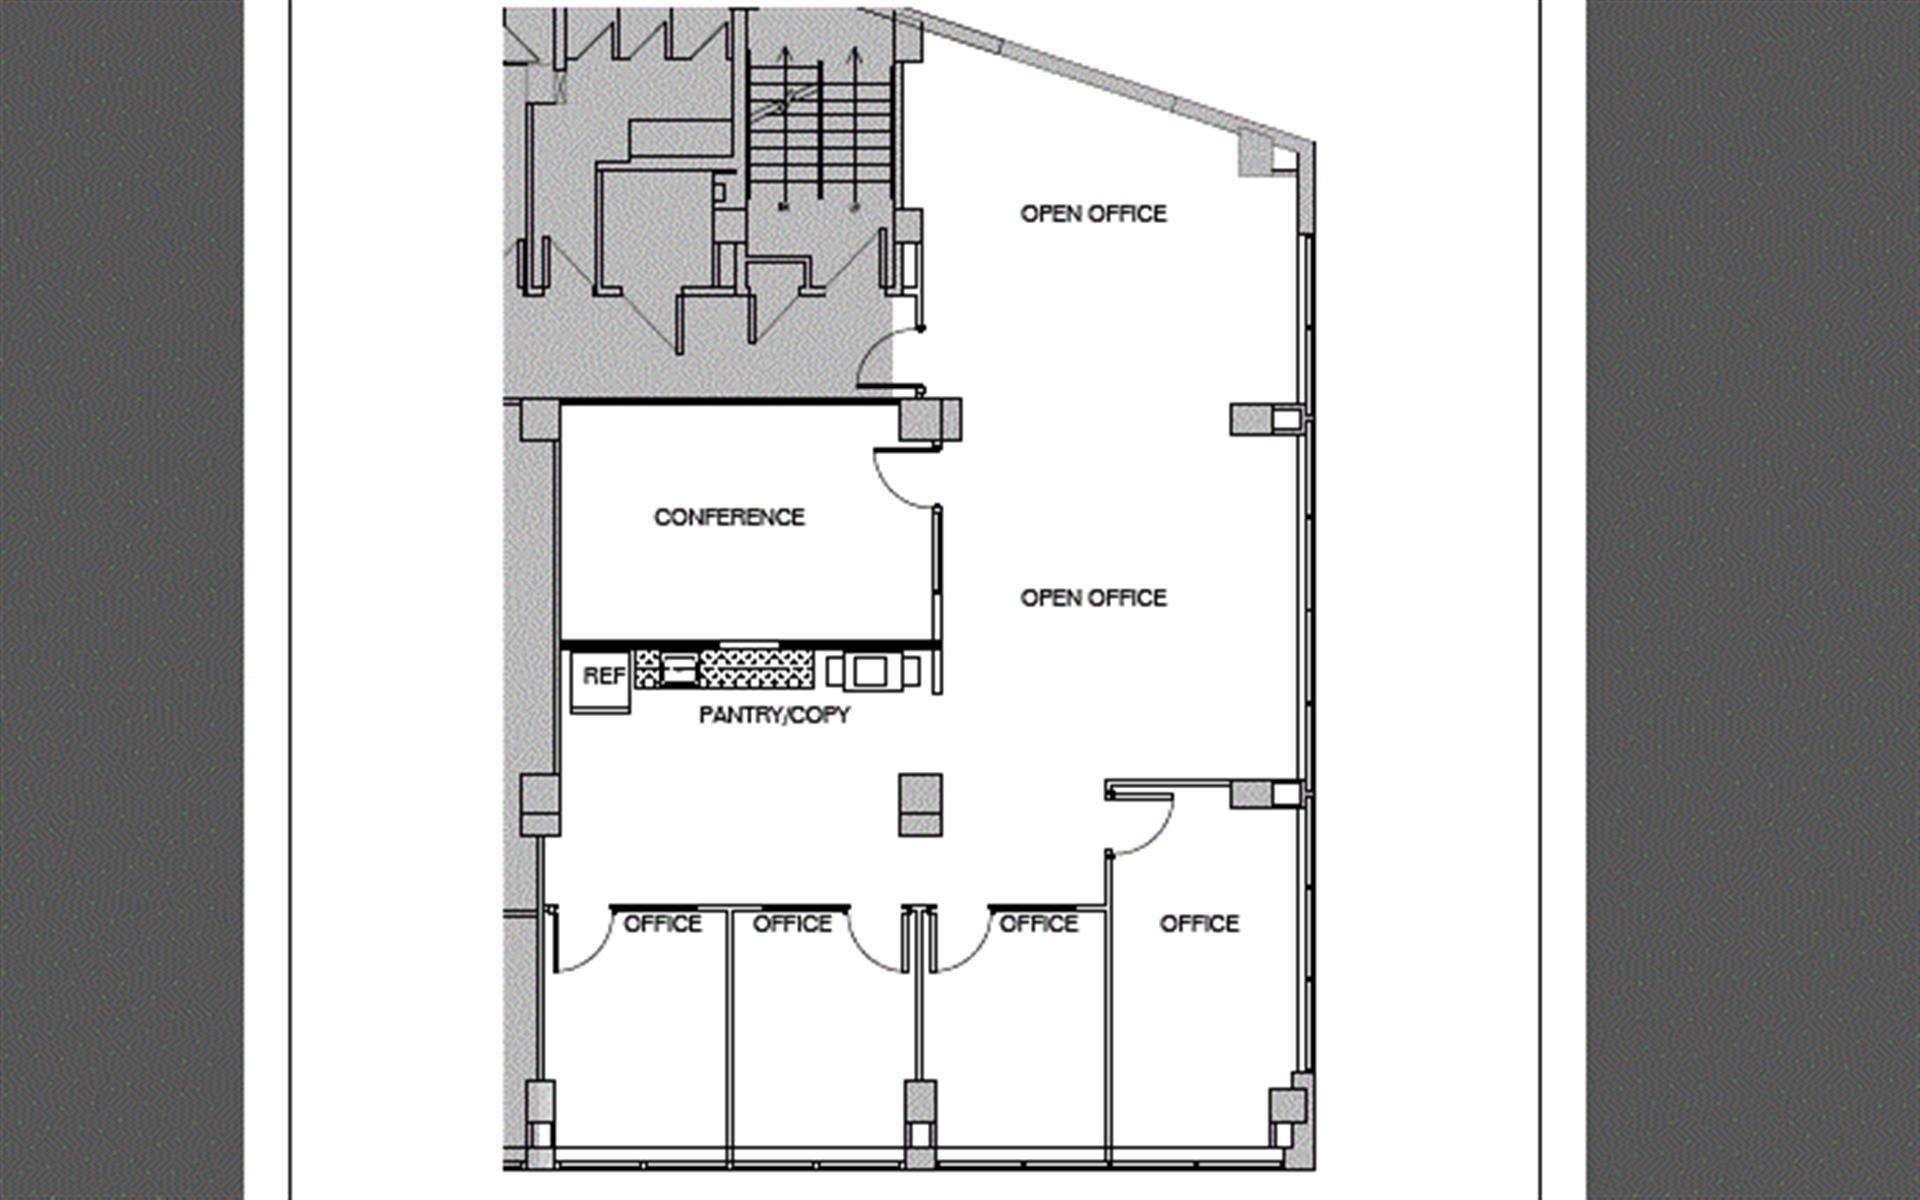 WashingtonREIT | 1901 Pennsylvania Avenue - Team Office | Suite 307